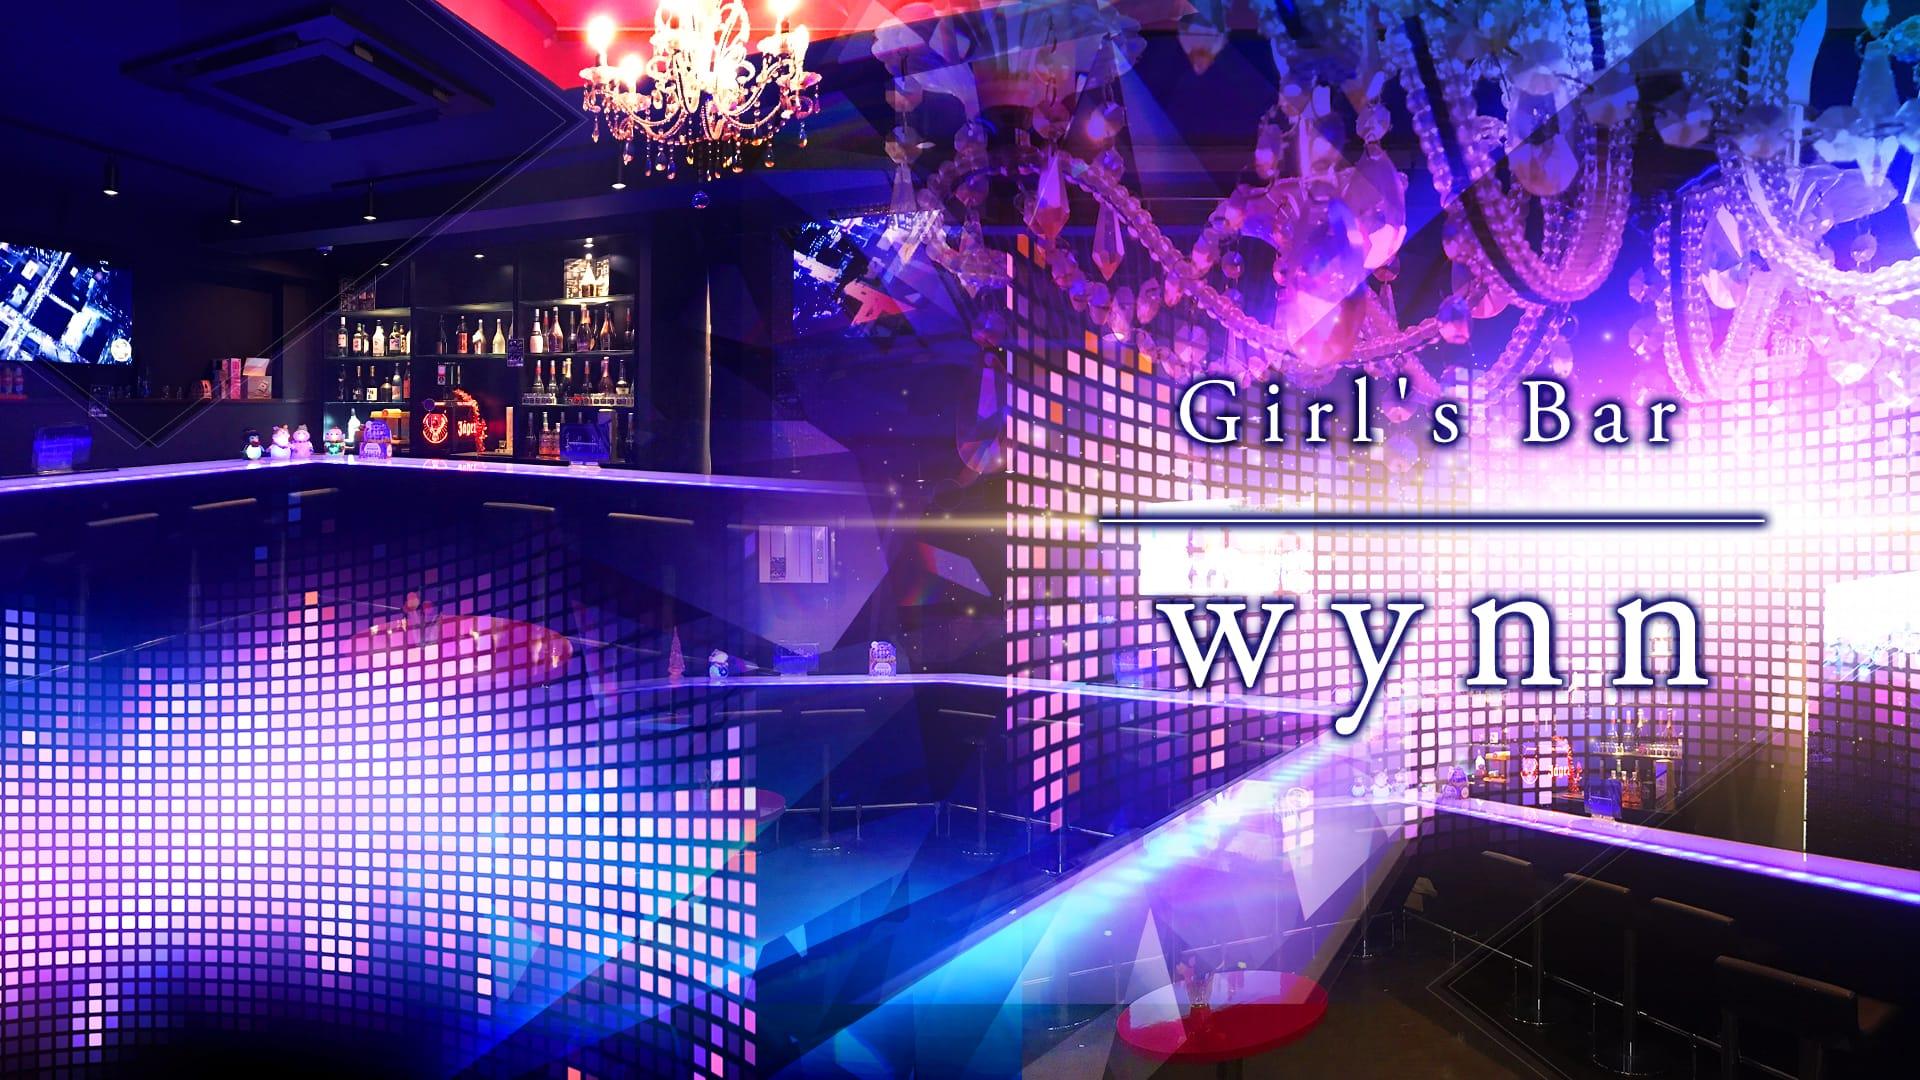 Girl's bar wynn津田沼店(ガールズバーウイン) 津田沼ガールズバー TOP画像